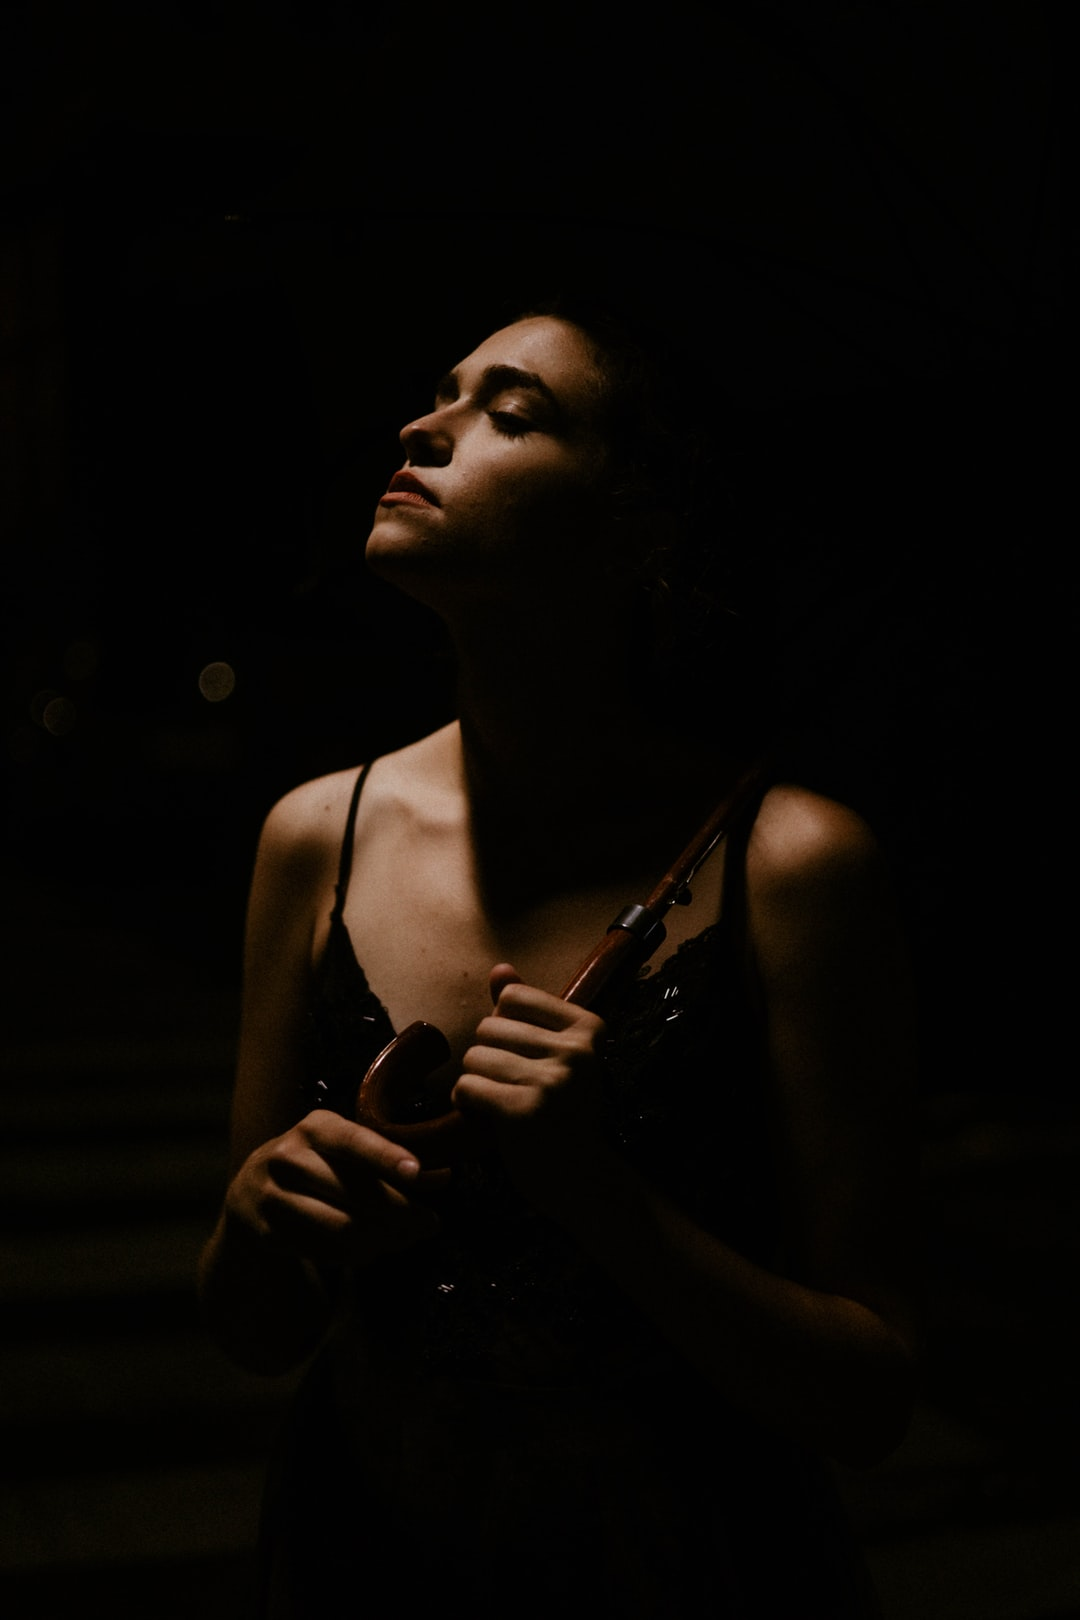 woman in white tank top holding black dslr camera